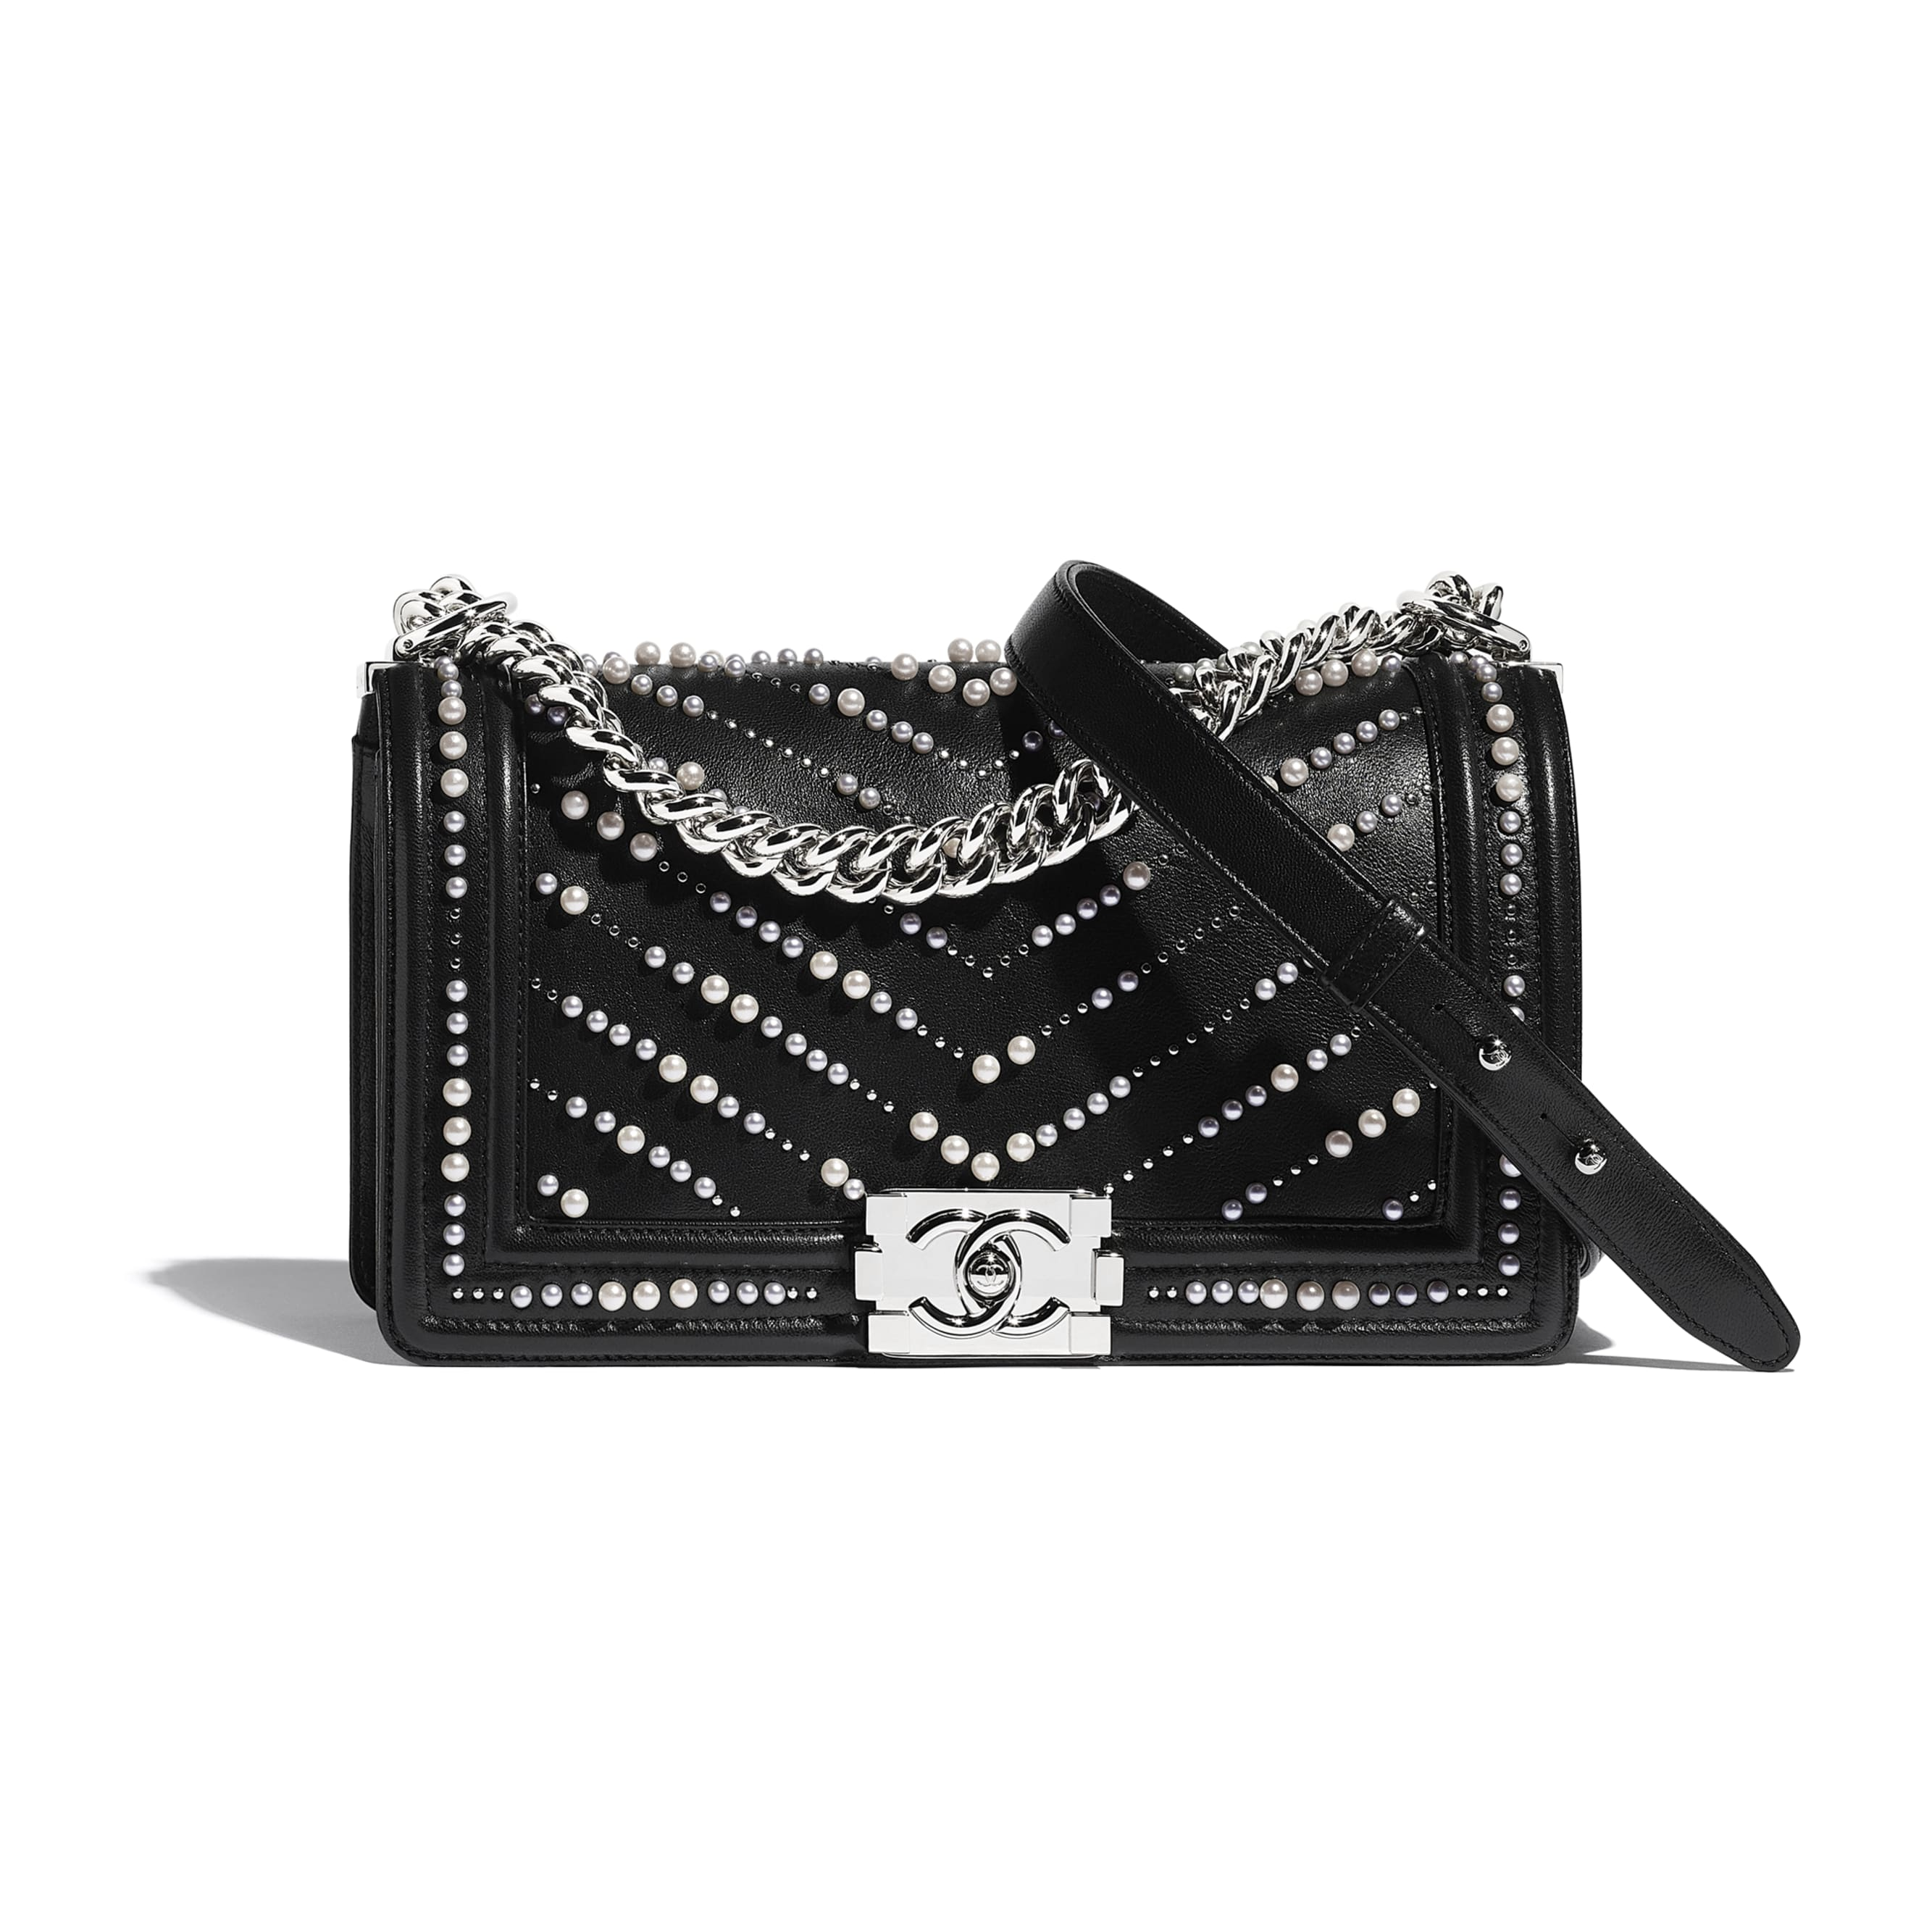 BOY CHANEL Handbag - Black - Calfskin, Imitation Pearls & Silver-Tone Metal - CHANEL - Default view - see standard sized version